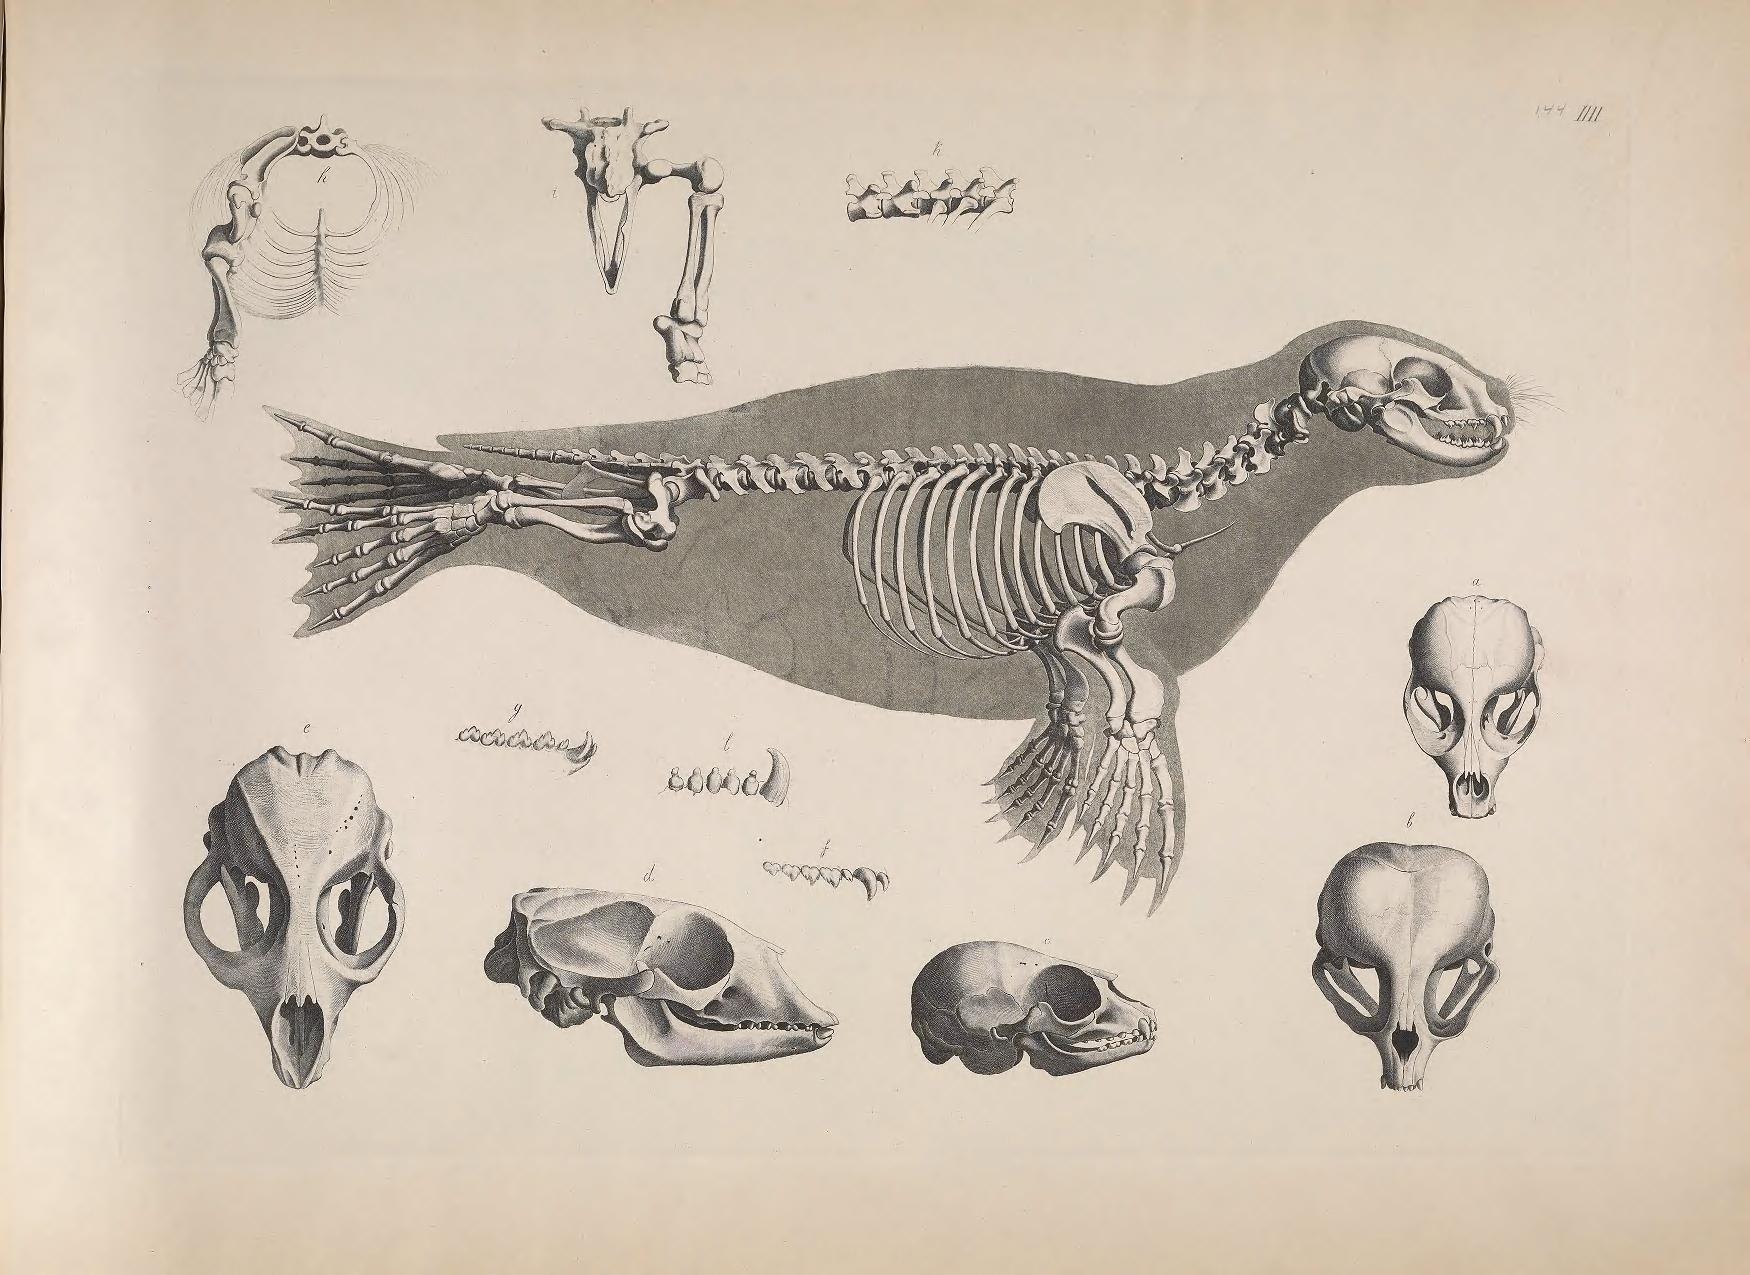 harbor seal skeleton carnivora phocidae phoca vitulina osteology rh pinterest com